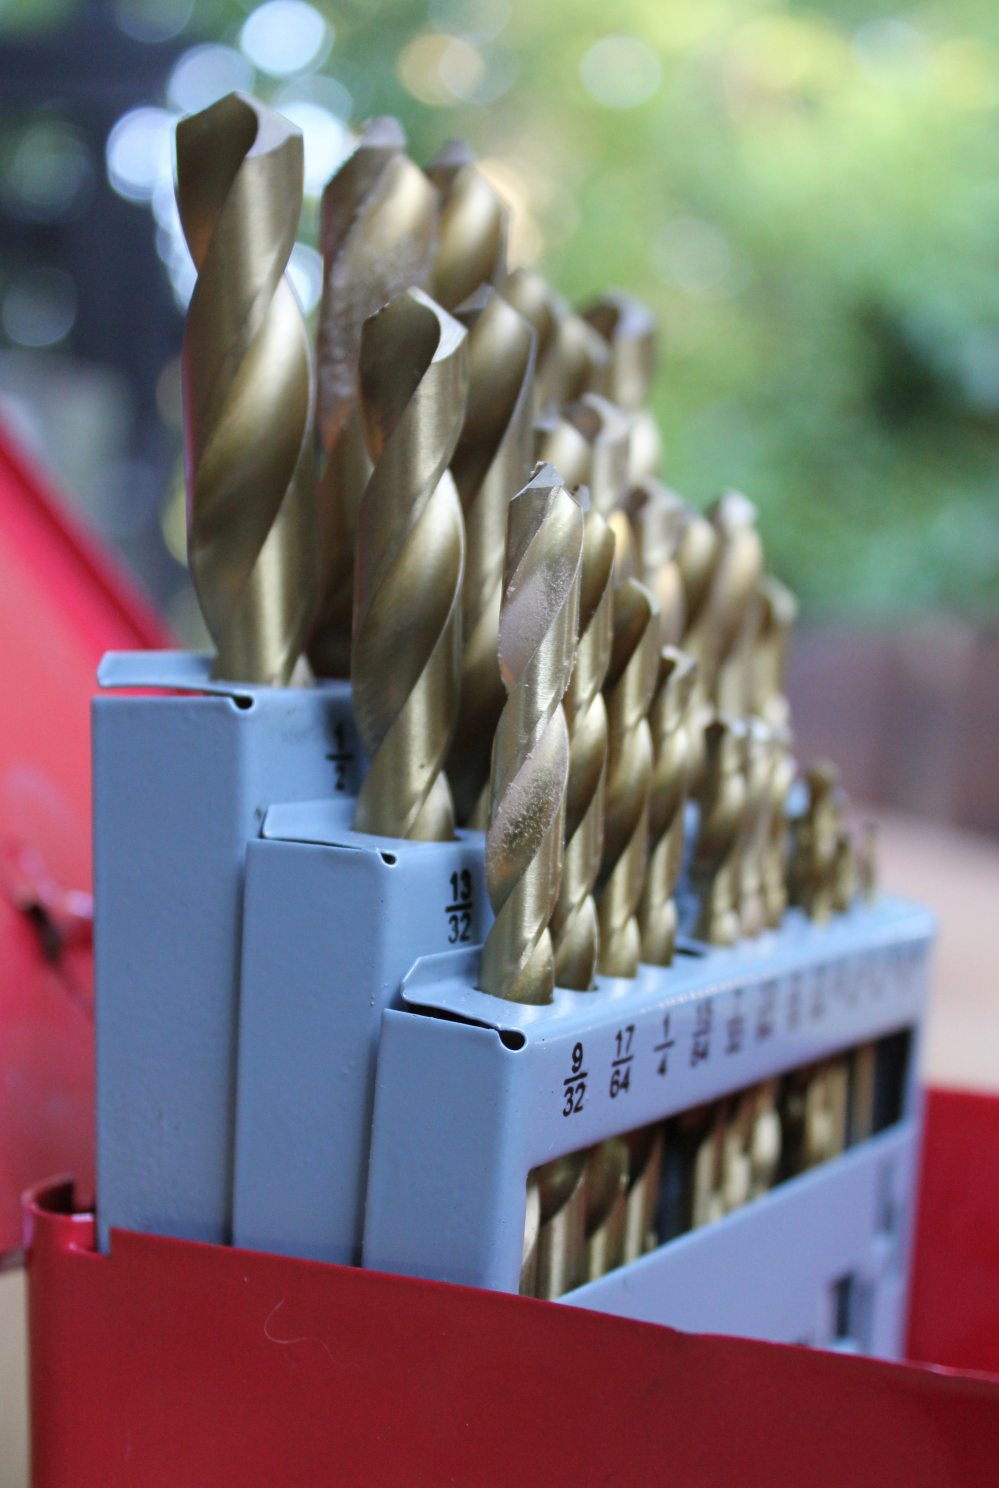 drills-toolbox-tools-20791.jpg